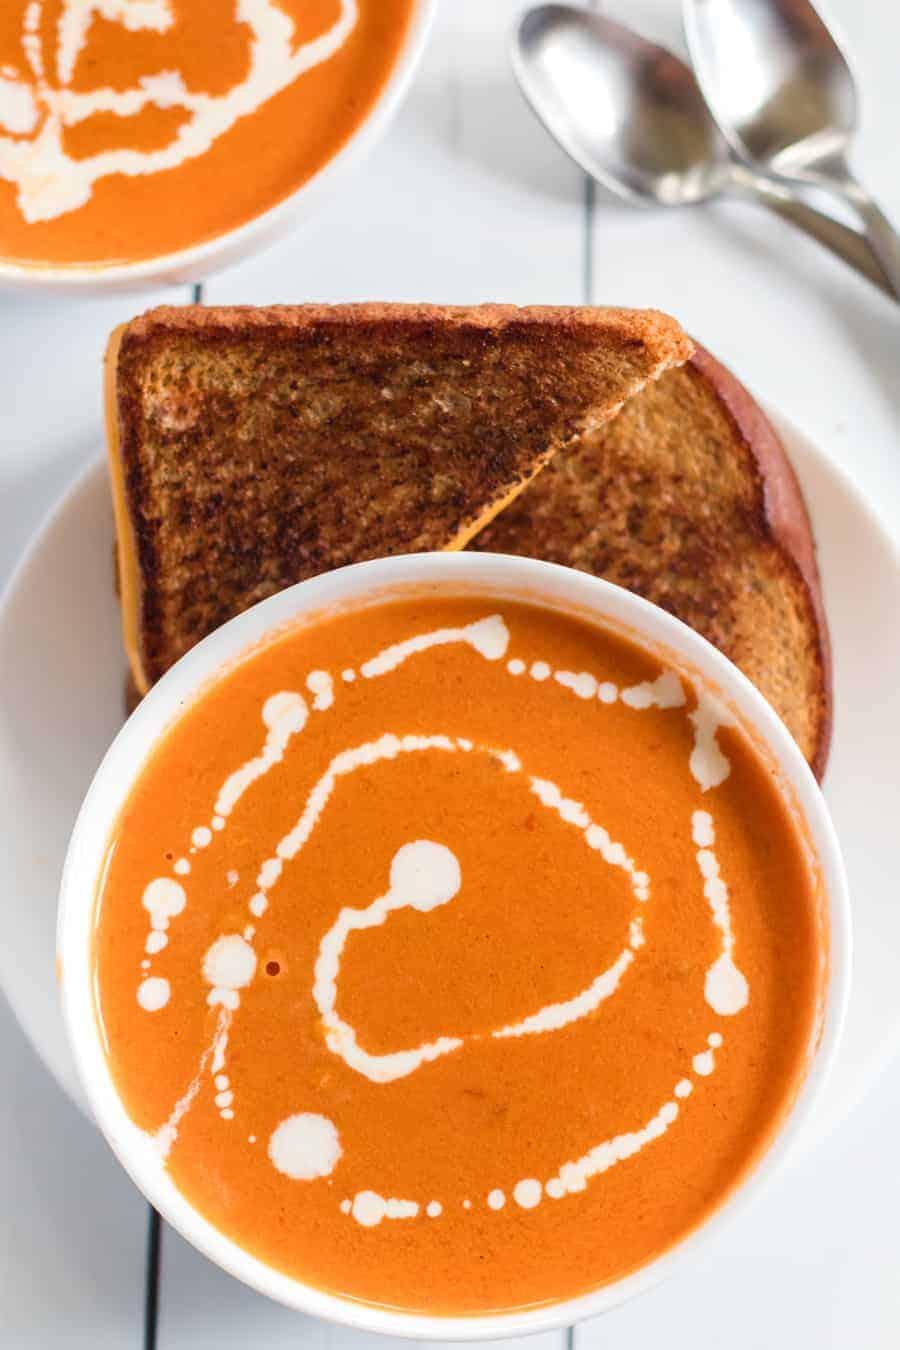 Simple Cream of Tomato Soup